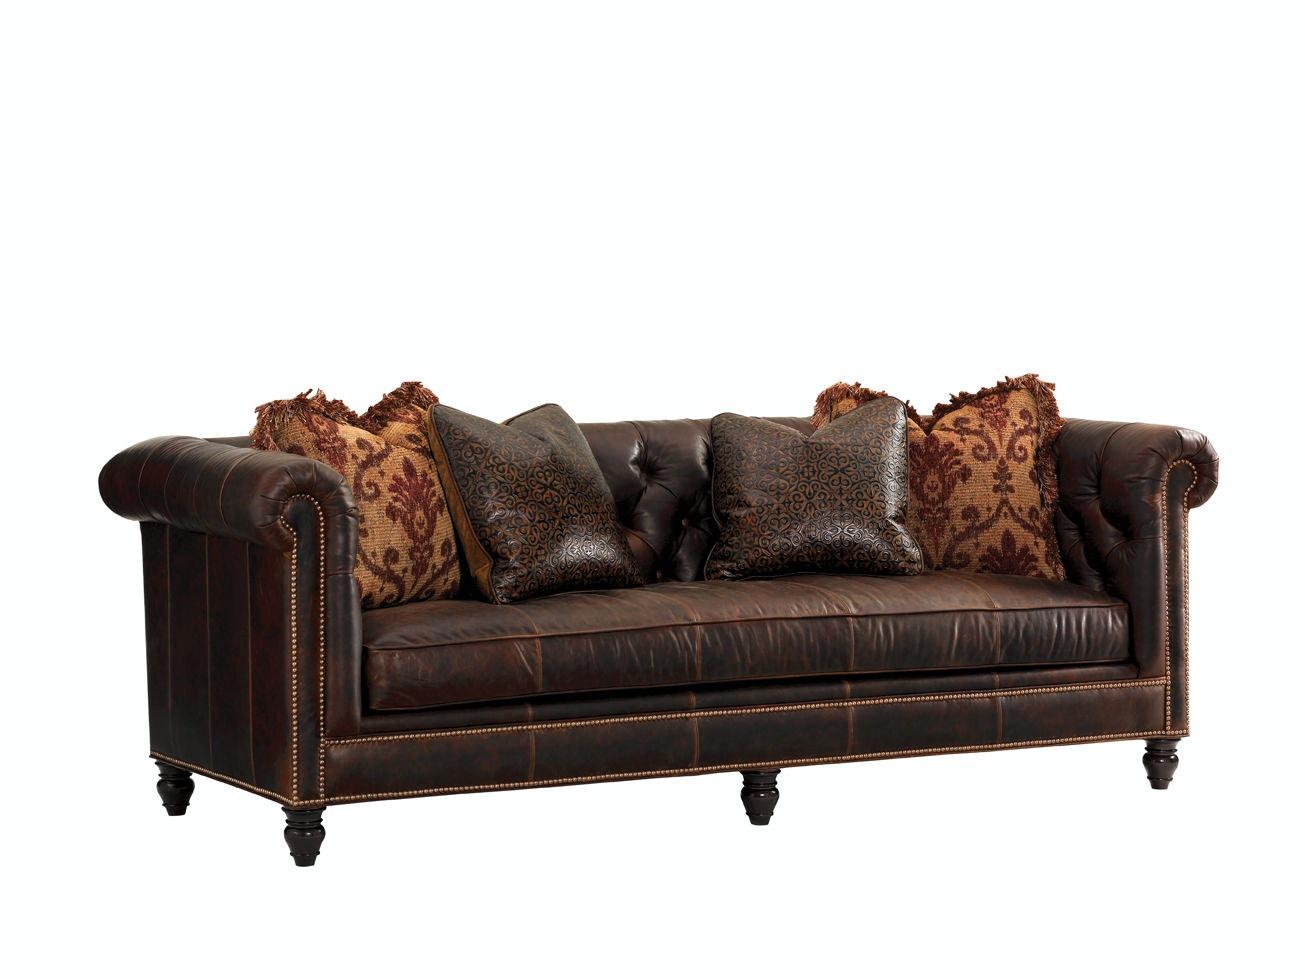 Charmant Lexington Living Room Manchester Leather Sofa LL7994 33AA   Louis Shanks    Austin, San Antonio TX